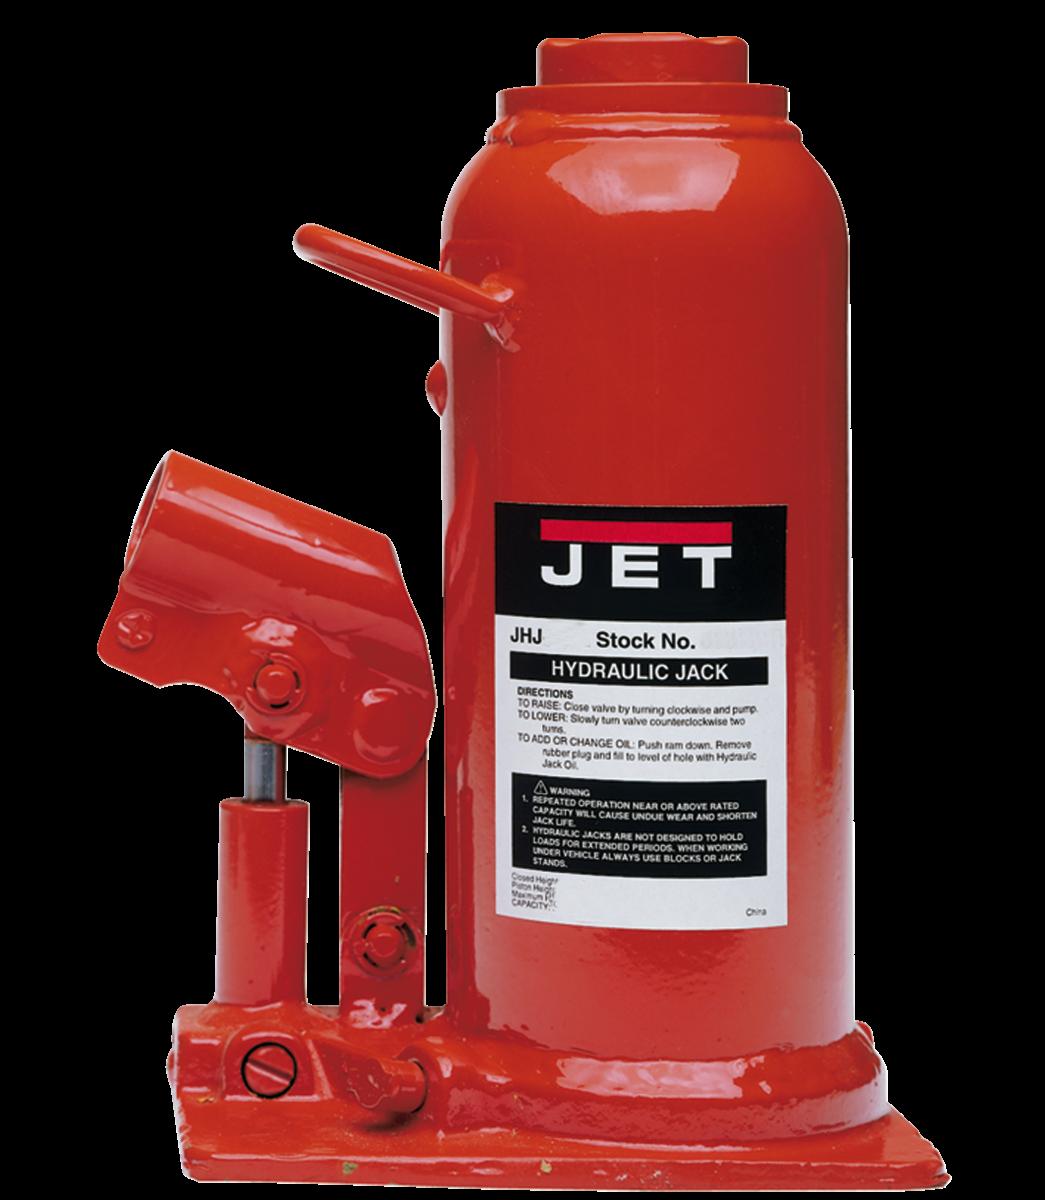 JHJ-17-1/2, 17-1/2-Ton Hydraulic Bottle Jack